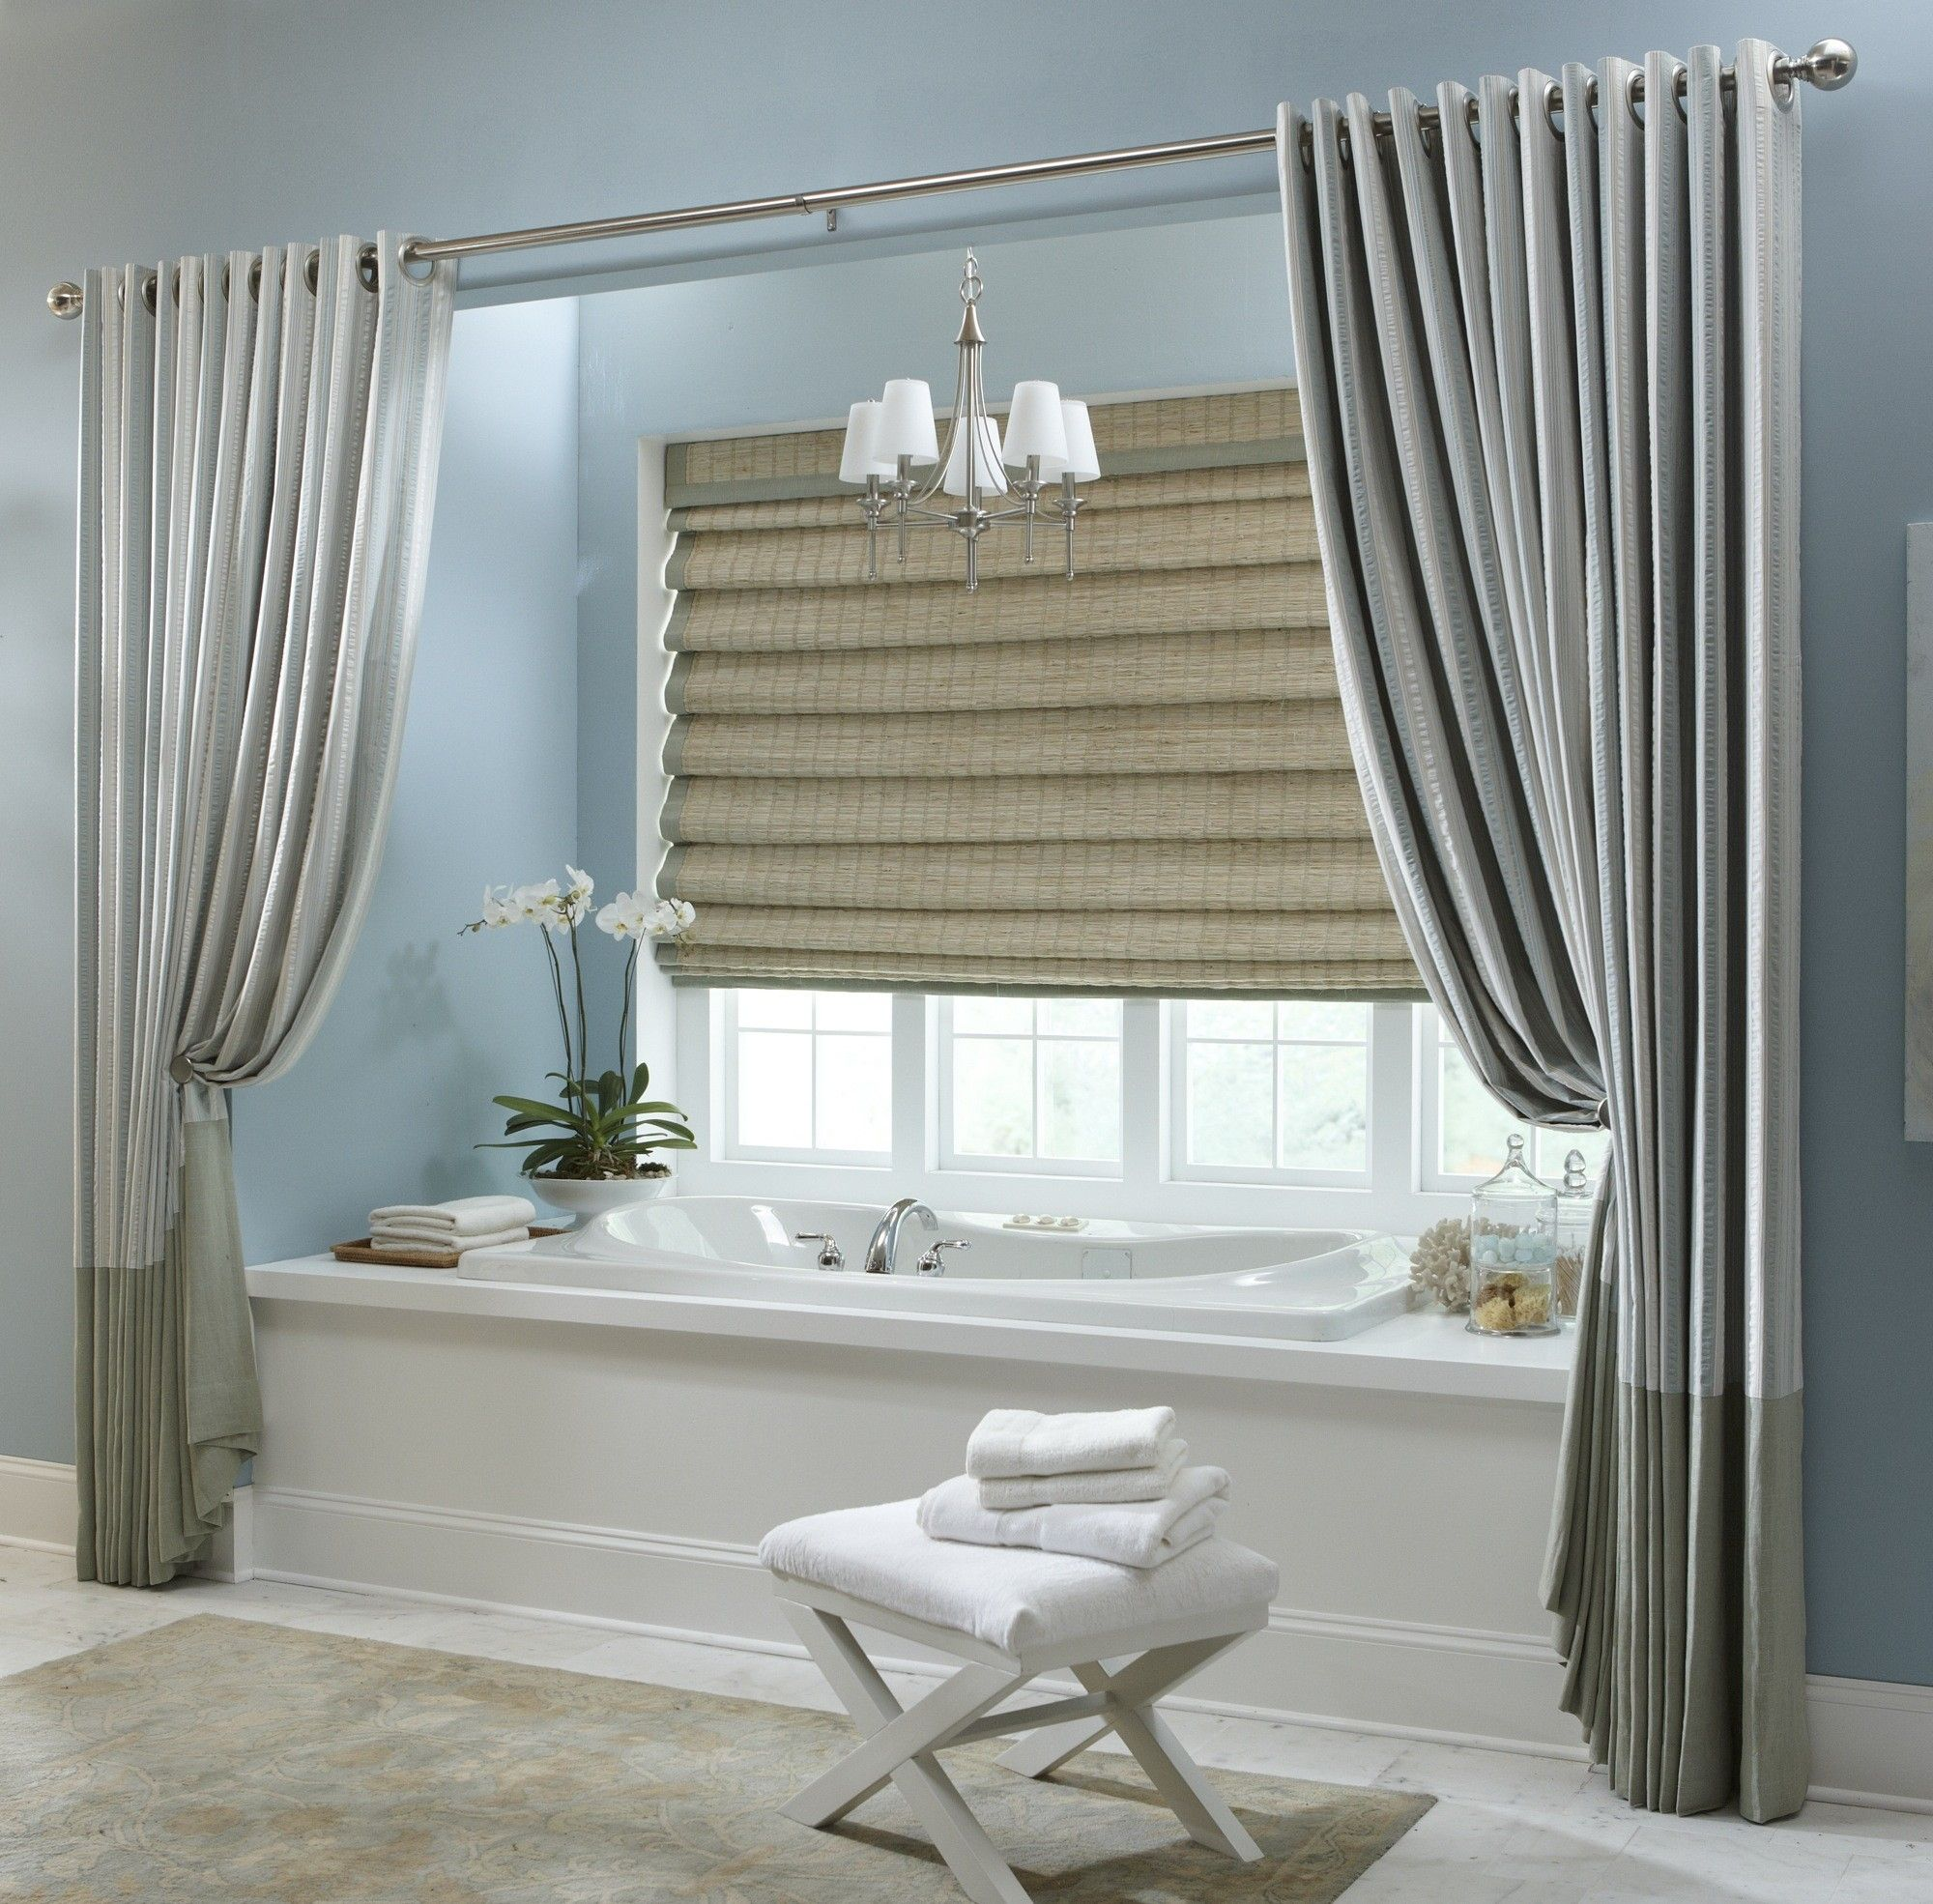 Silver bathroom window curtains realtagfo pinterest